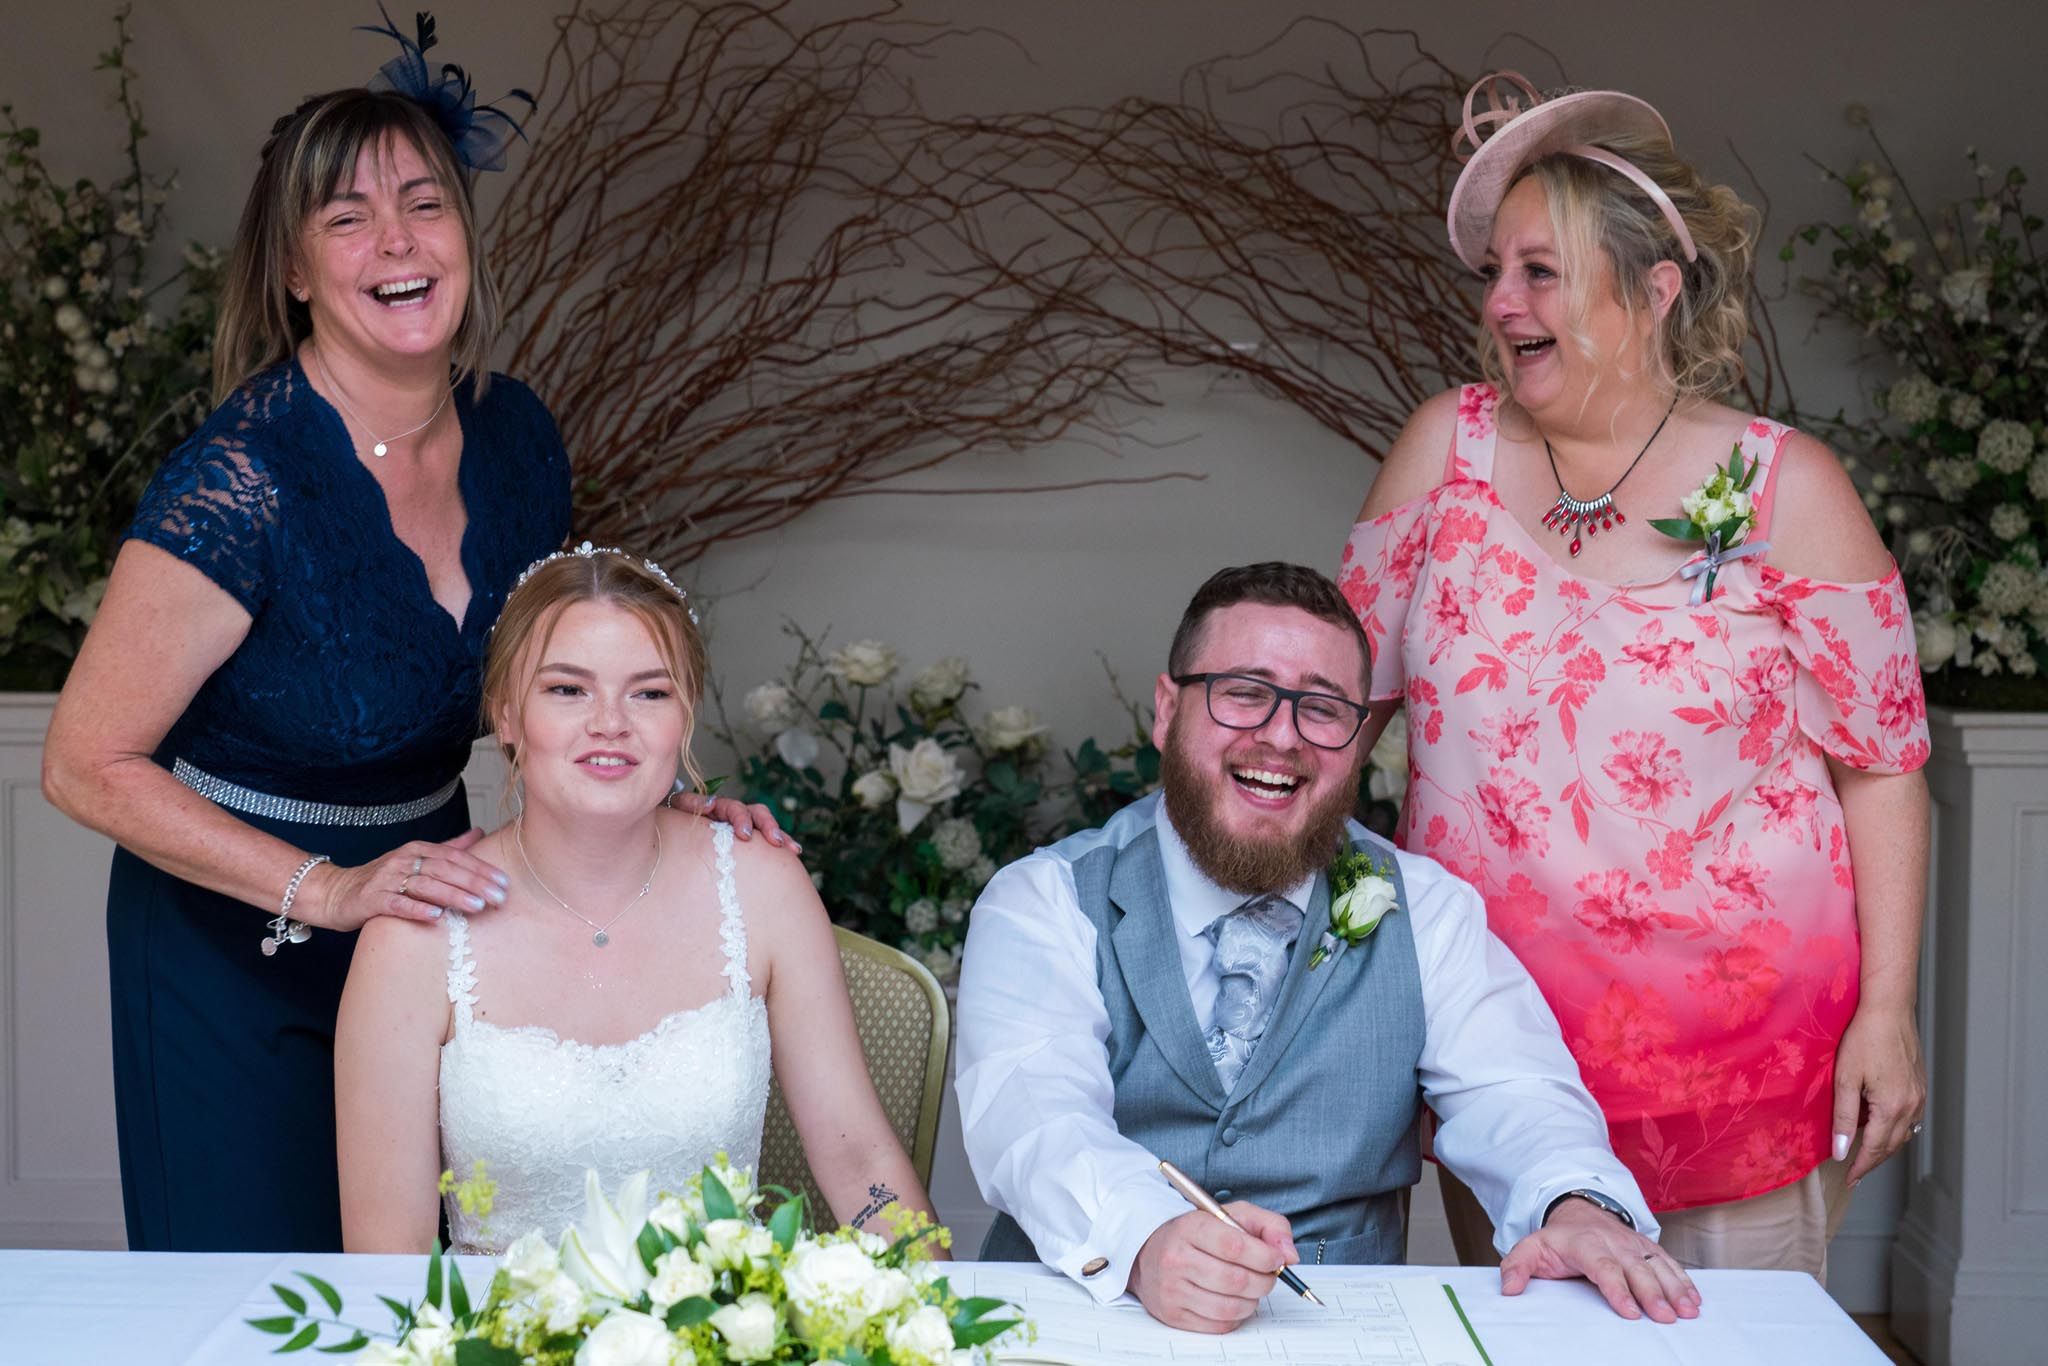 474-Ceremony-Luke-Yasmin-The-Rayleigh-Club-Wedding-Photography.jpg